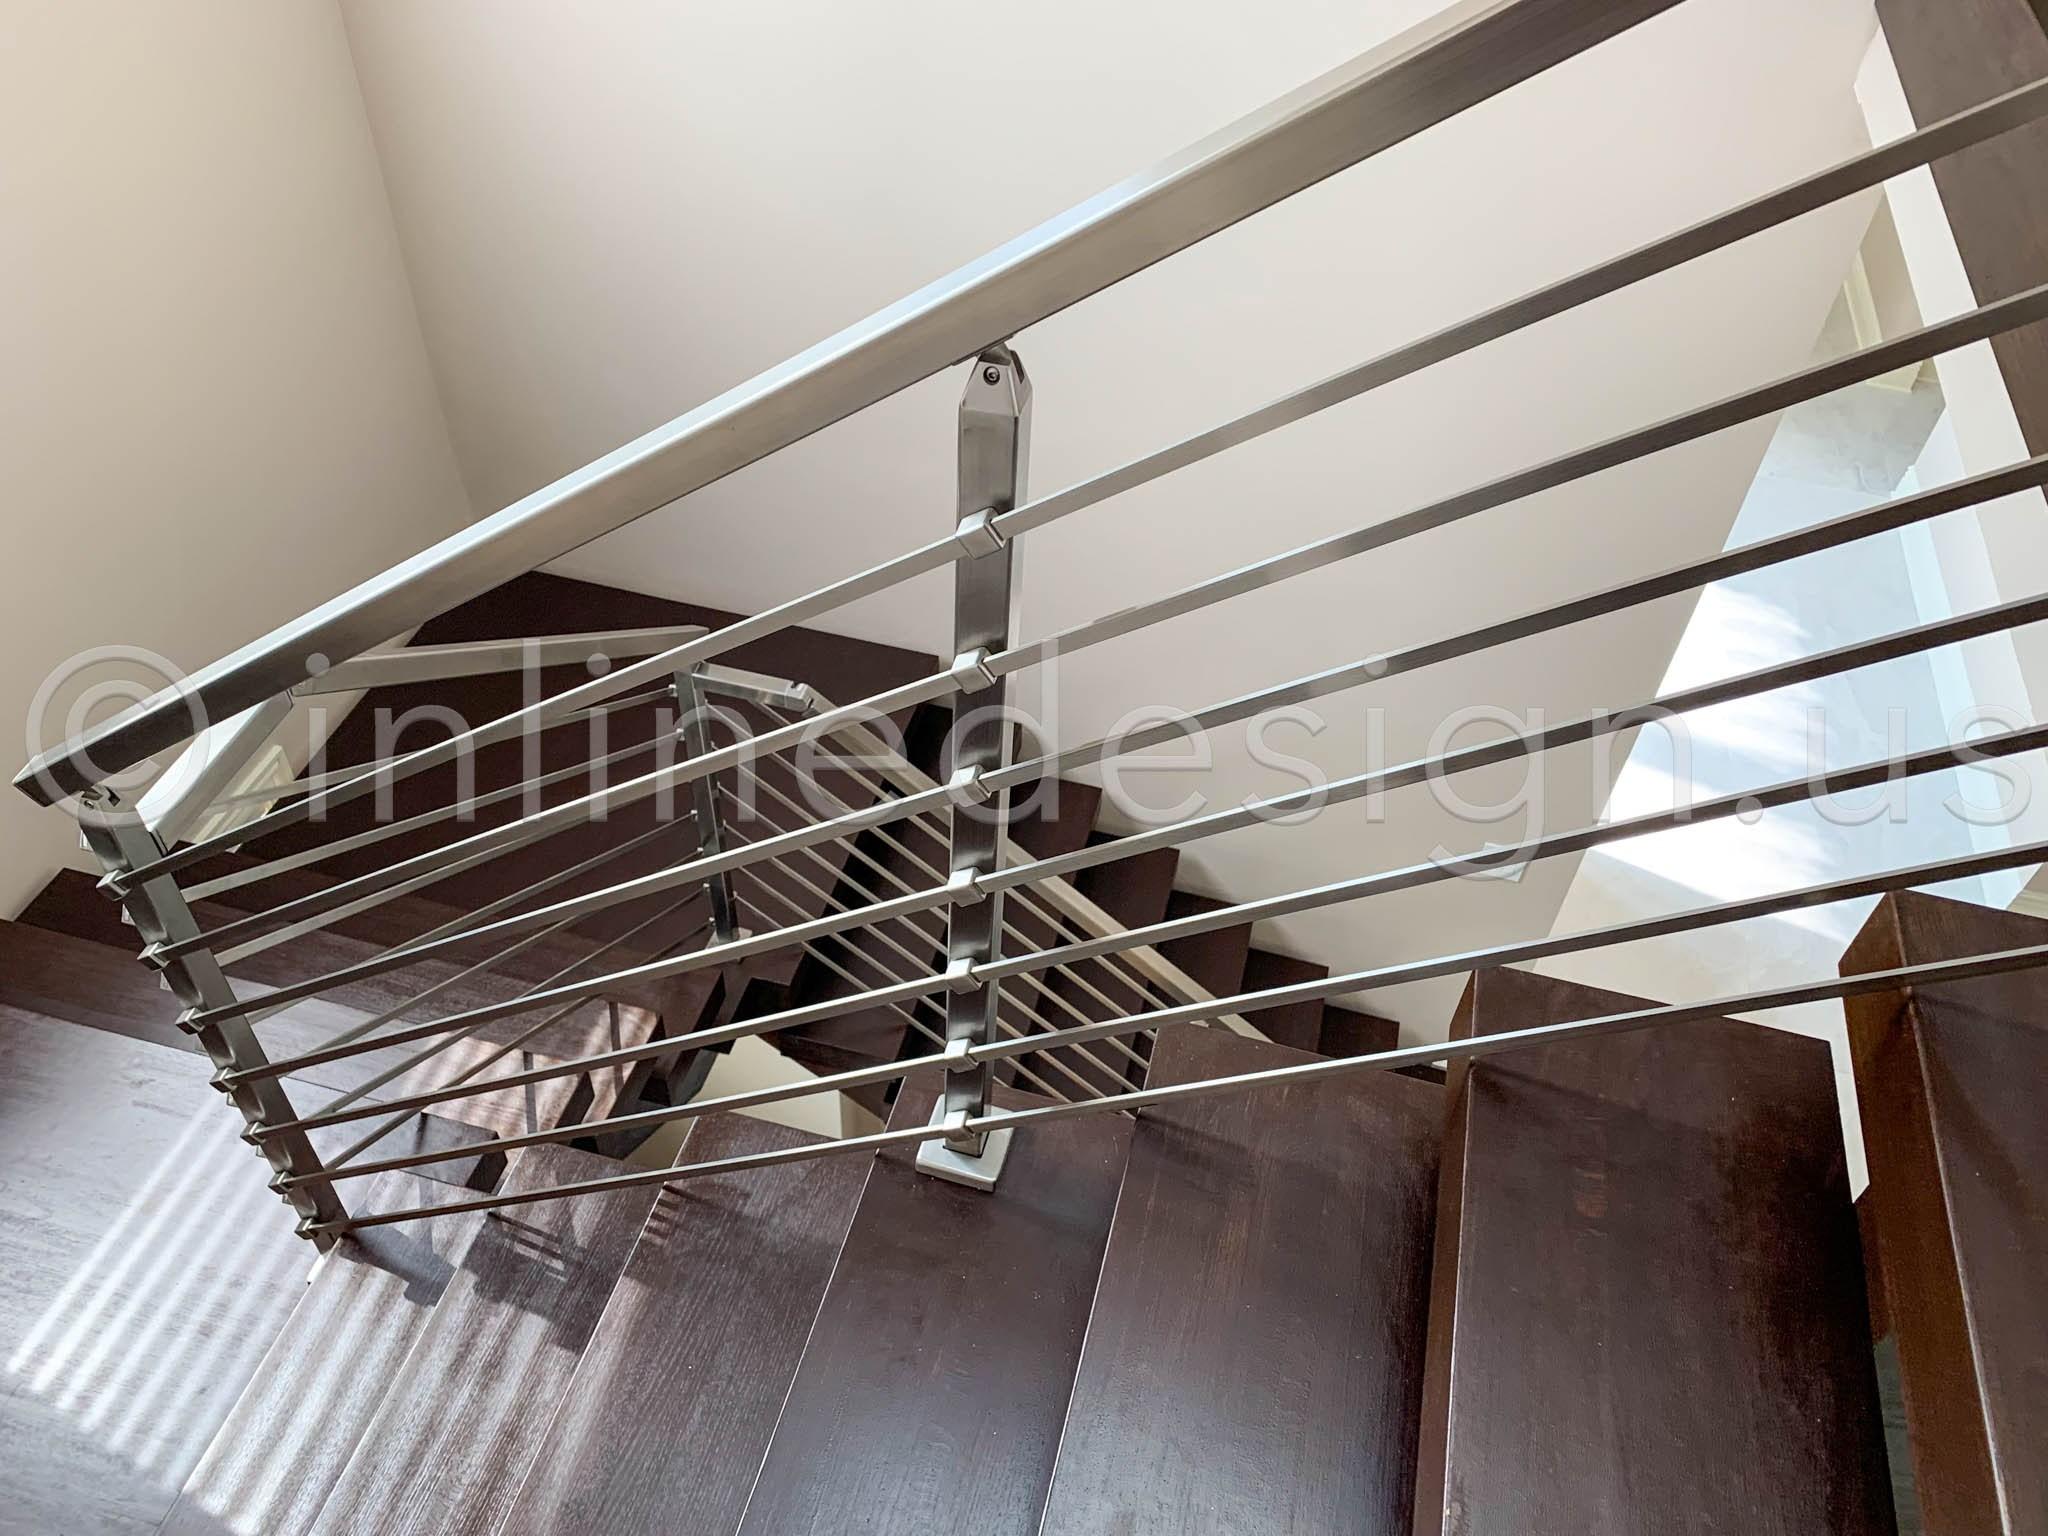 Modern Cable Railing On Mid Century Modern Architecture   Mid Century Modern Handrail   Porch   Interior   Art Deco   Wooden   Railing